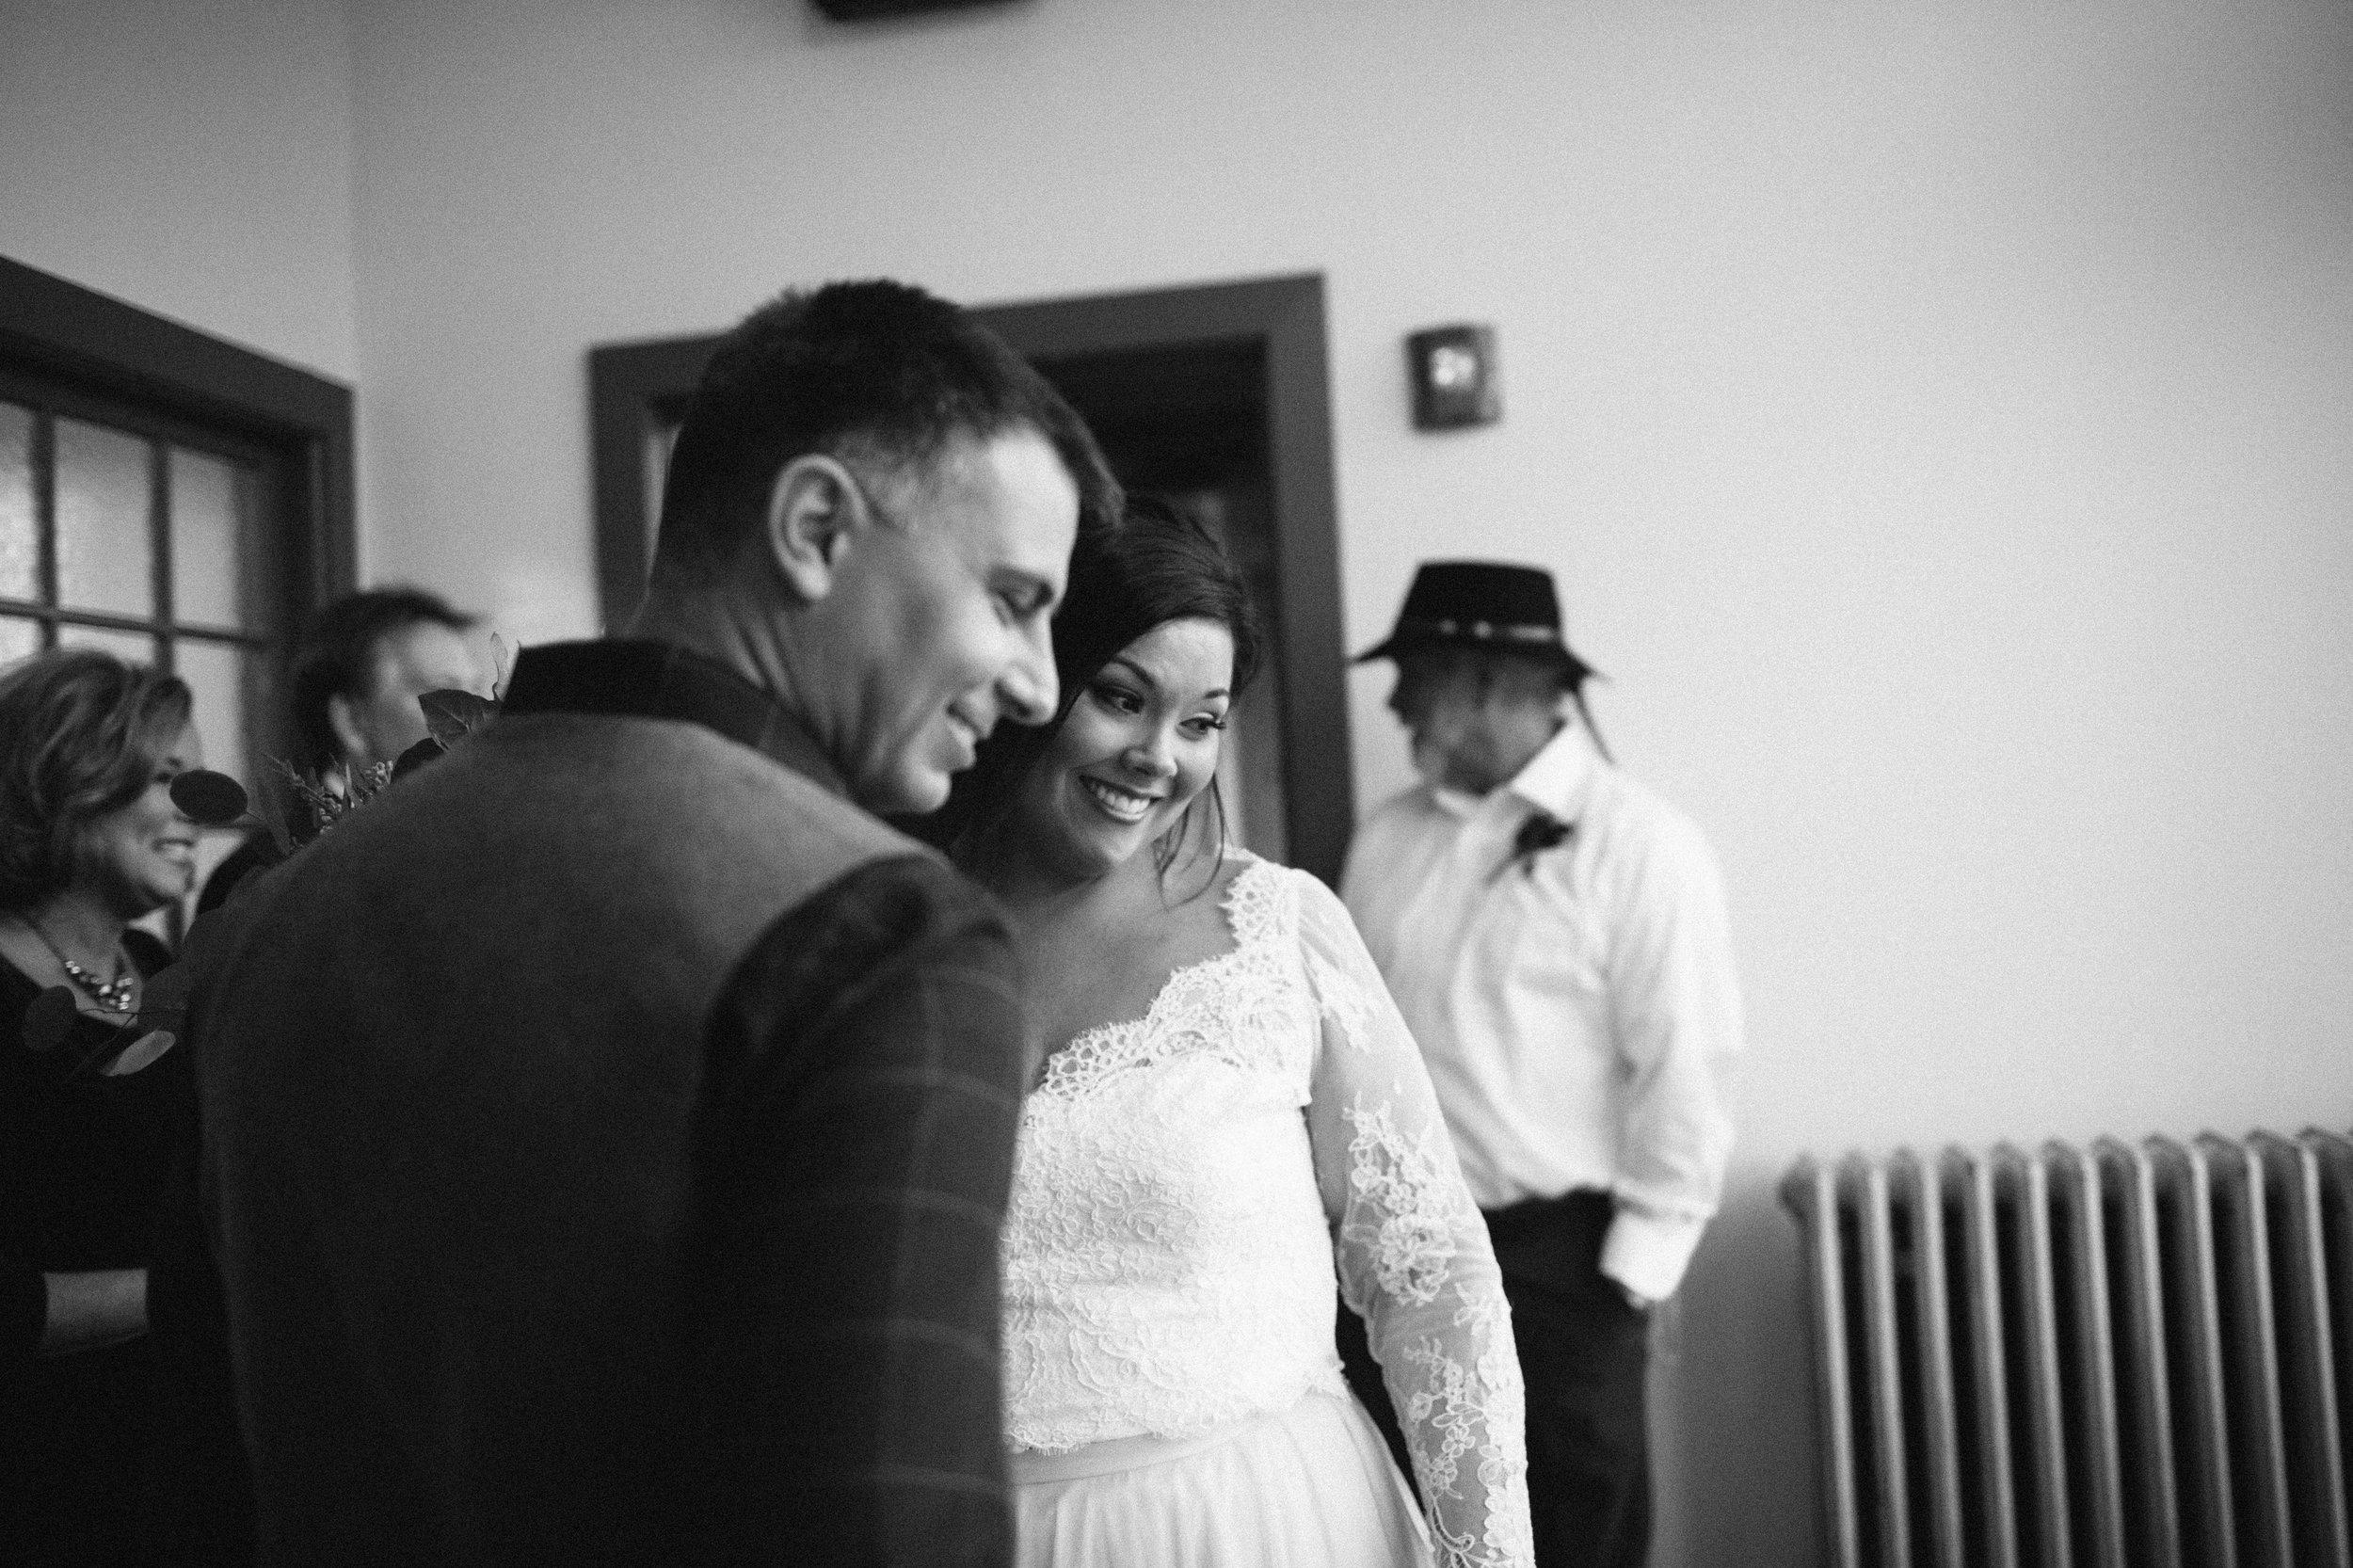 Lauren_Jeremy_Standard_Wedding_Knoxville_Abigail_Malone_Photography_FIlm-502.jpg